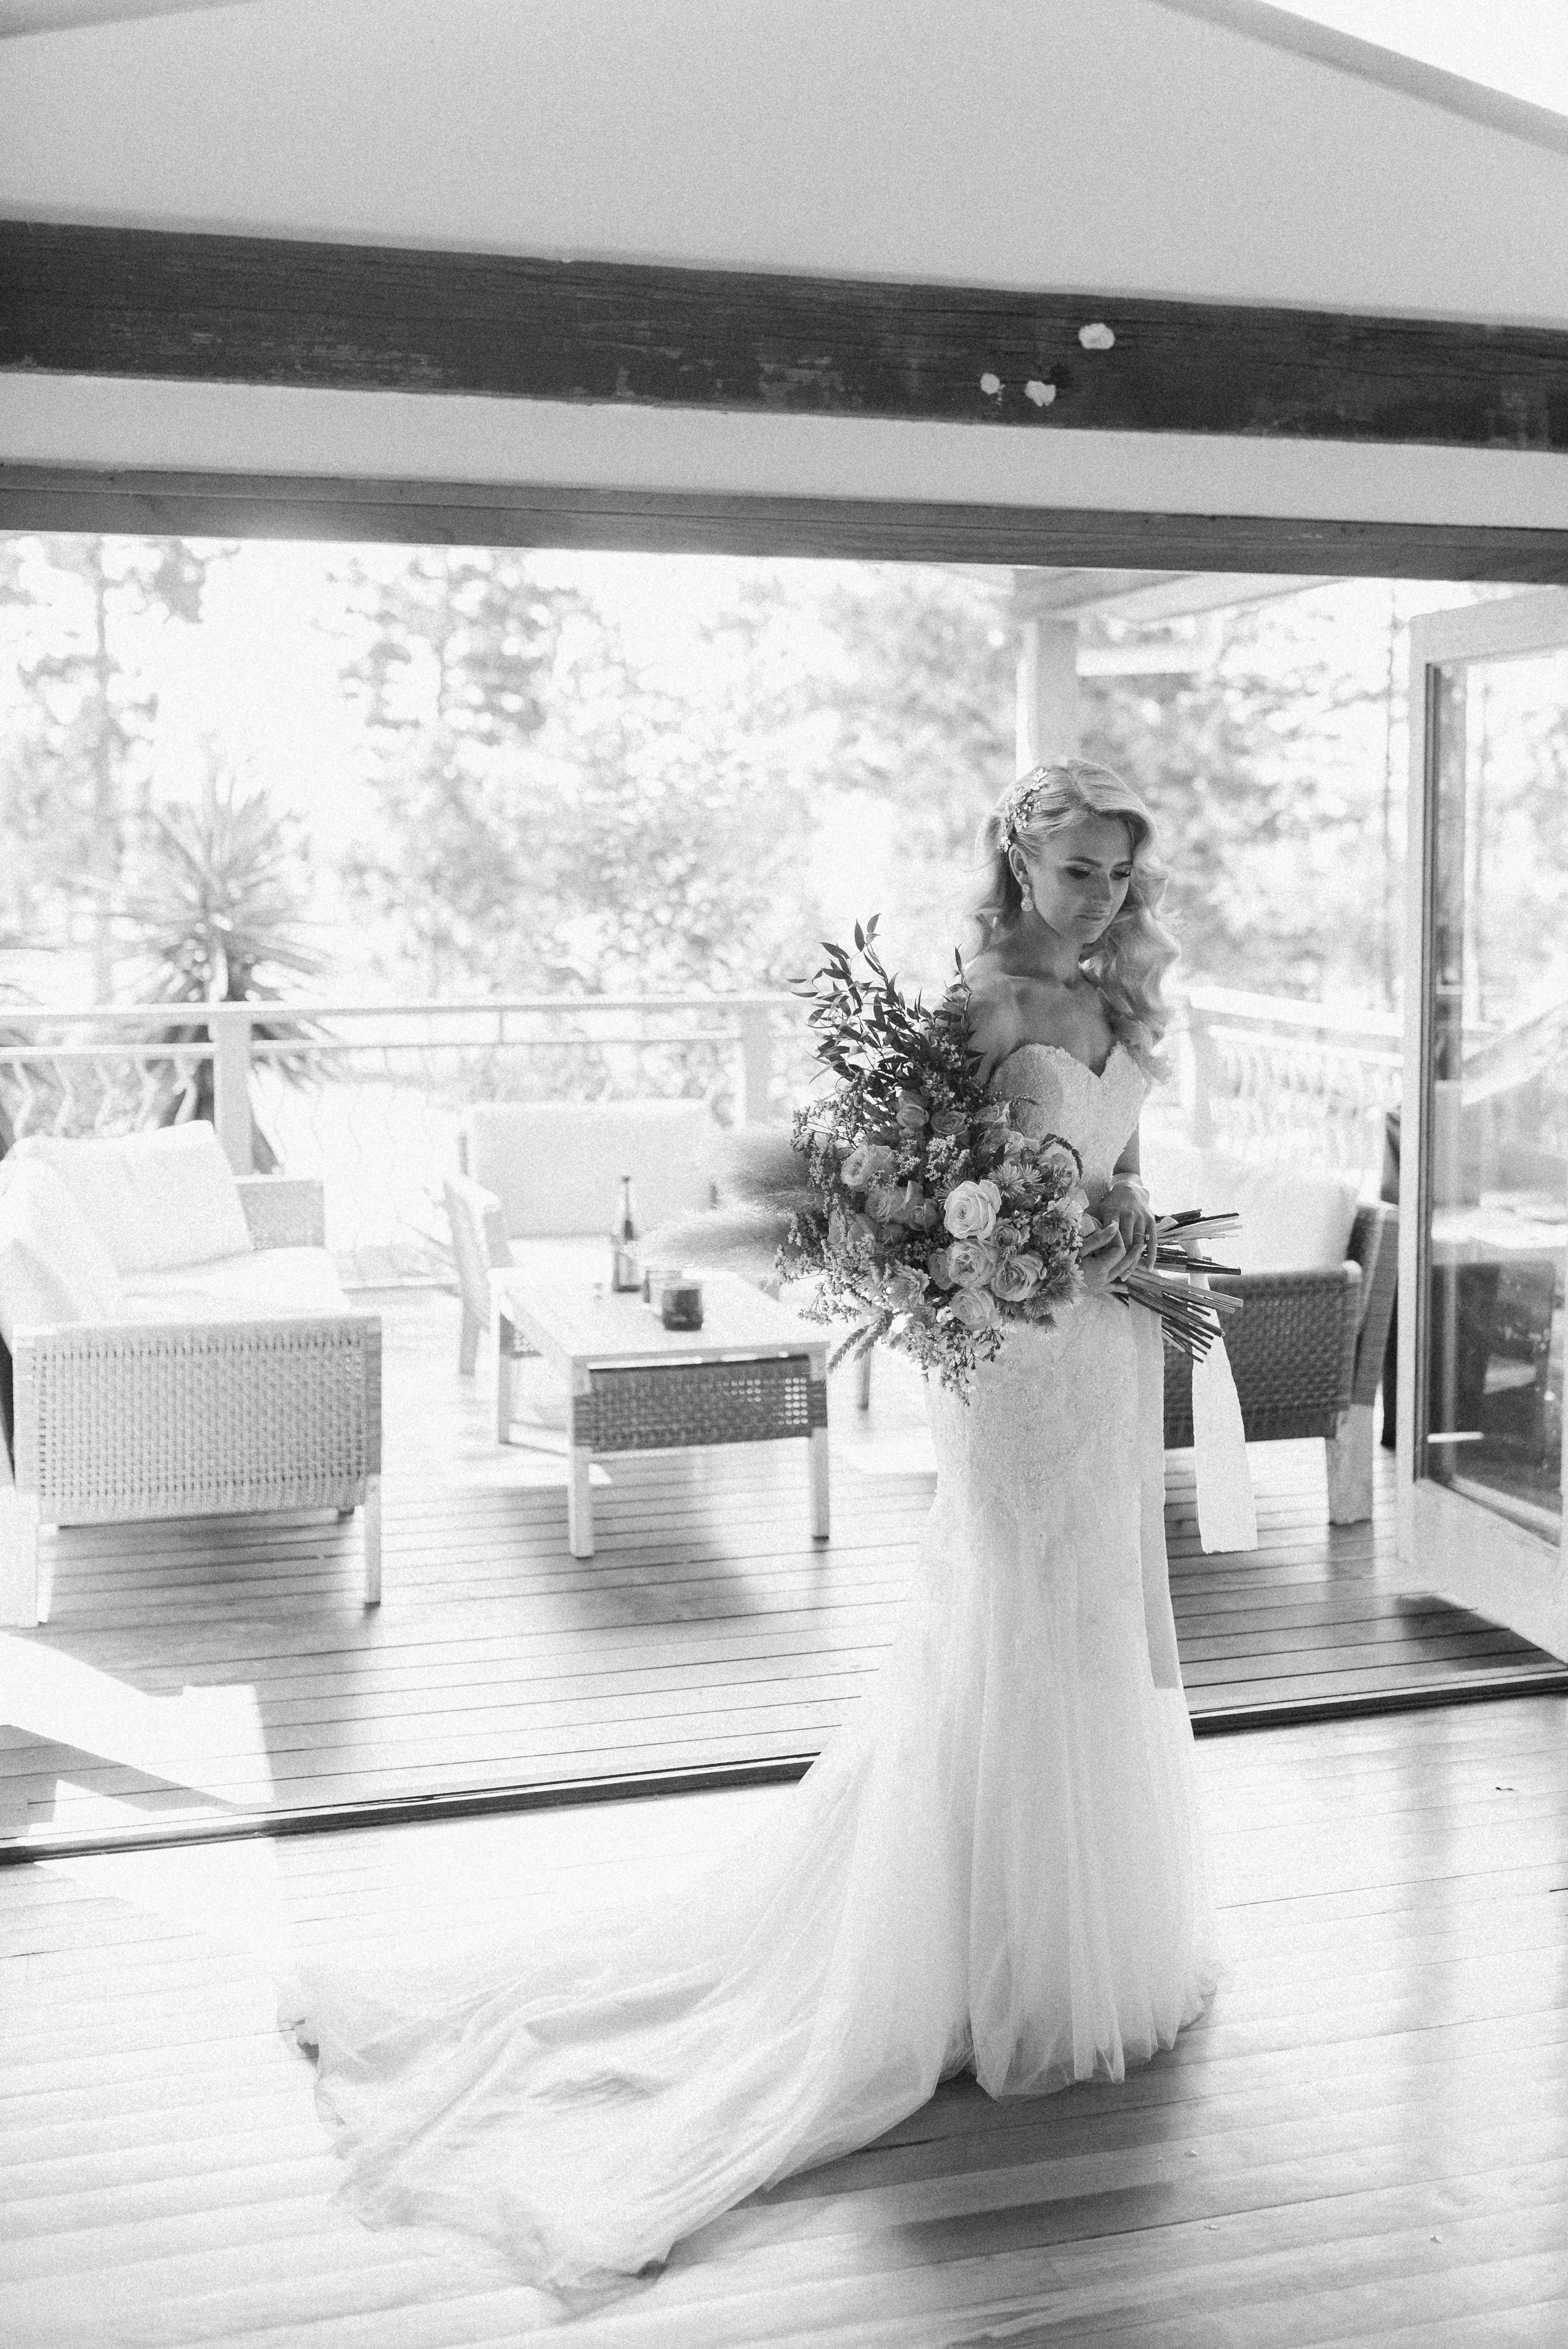 Kooroomba-Vineyard-Lavender-Farm-Wedding-Fine-Art-Lauren-Olivia-12.jpg